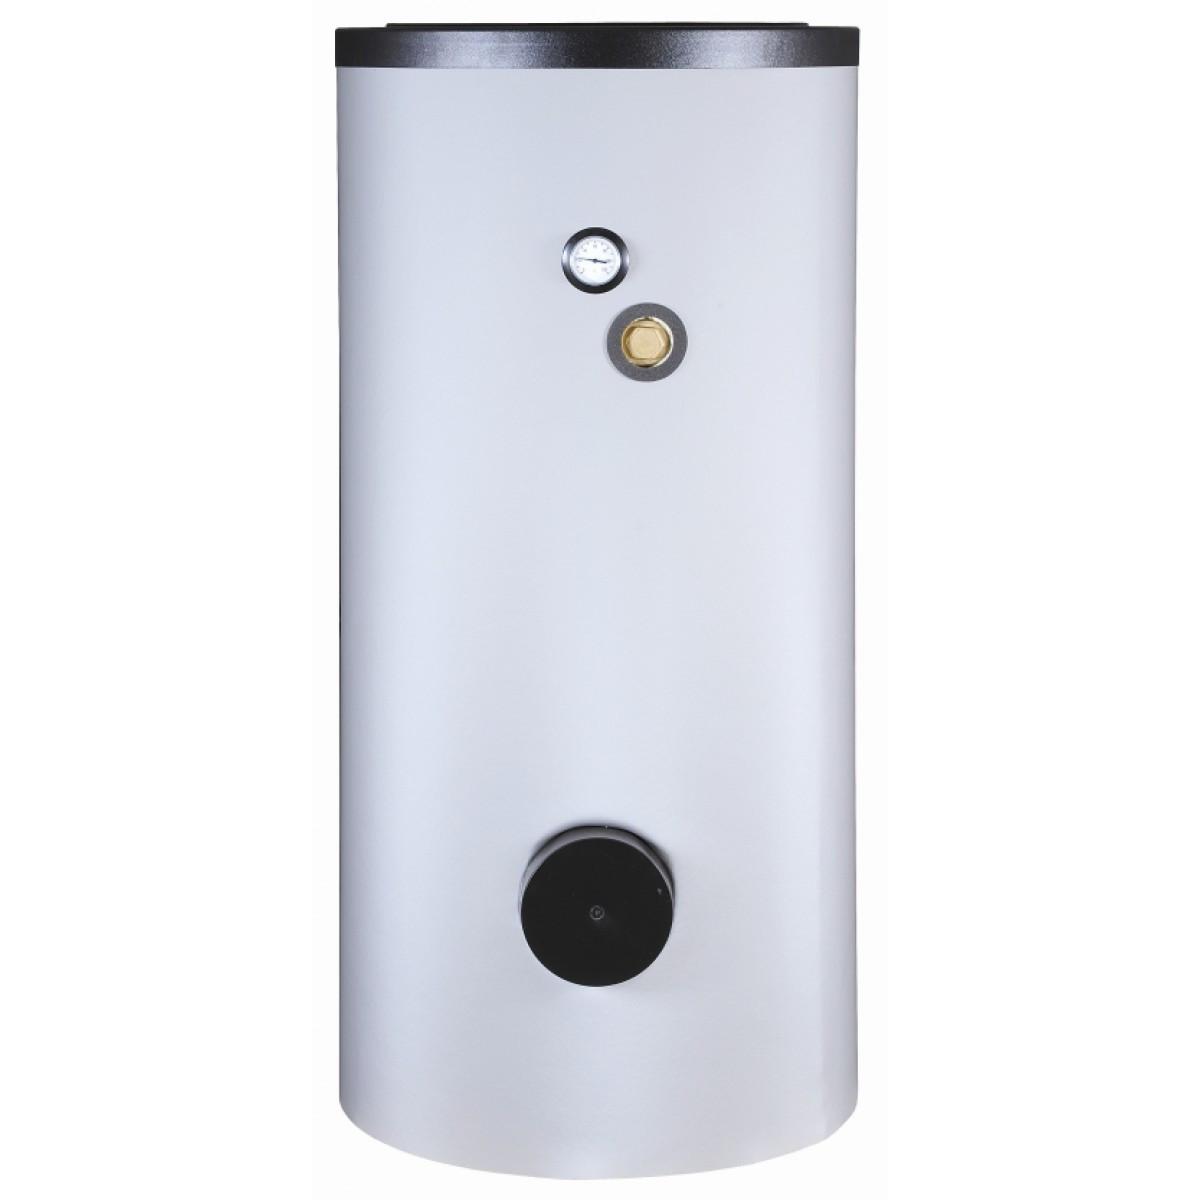 Бойлер косвенного нагрева Drazice OKC 400 NTR/HP